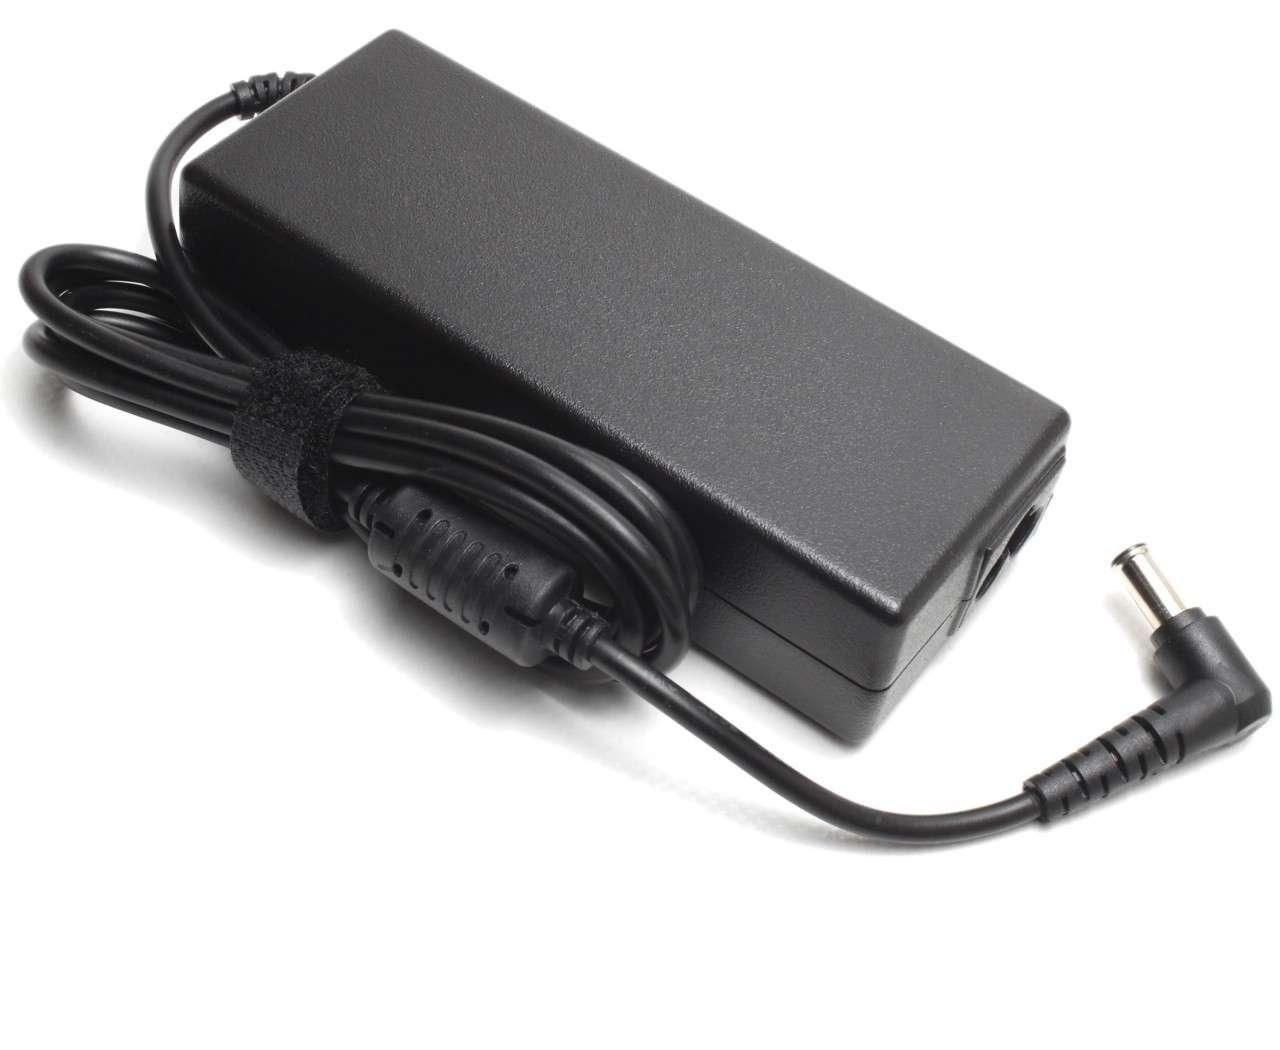 Incarcator Sony Vaio VPCCW2S1E Replacement imagine powerlaptop.ro 2021